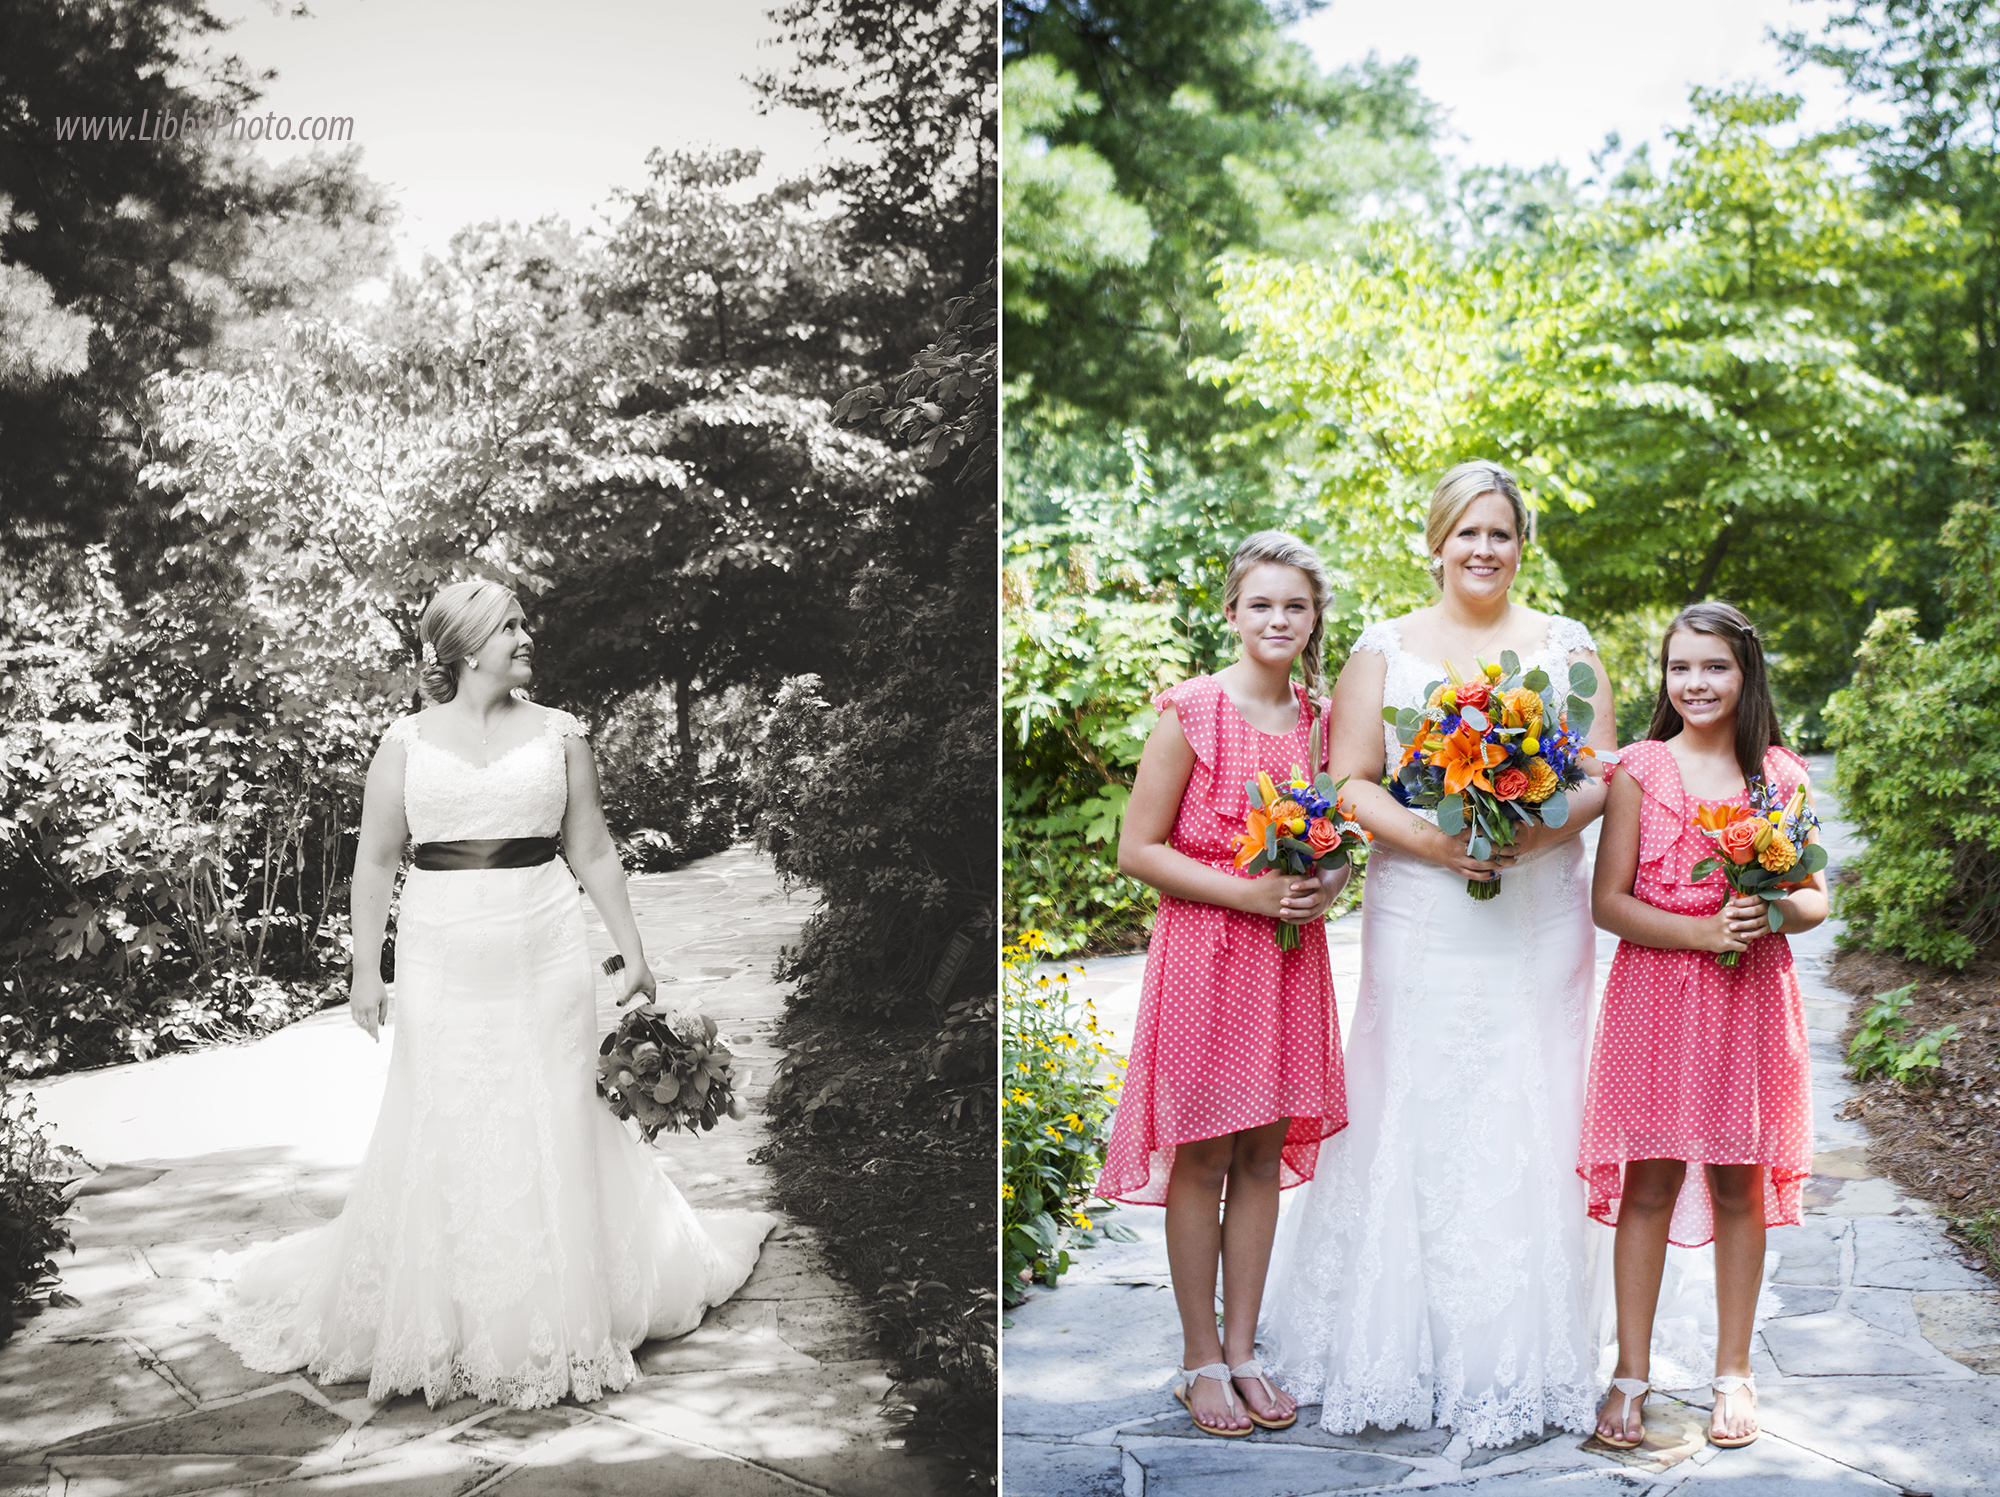 Atlanta wedding photography, Libbyphoto11 (35).jpg